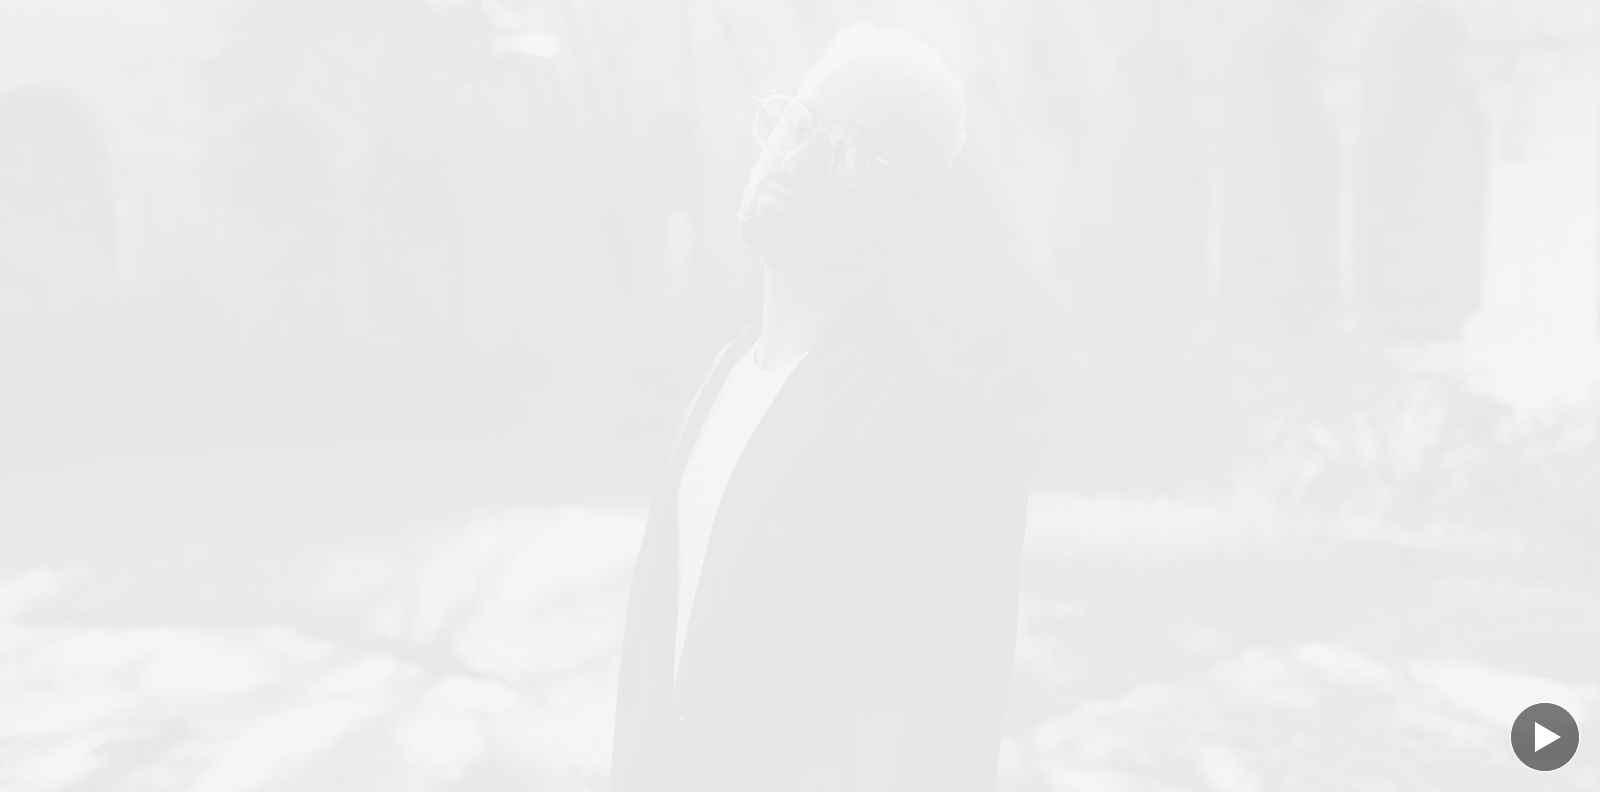 Малума представи нов сингъл и обяви предстоящ албум